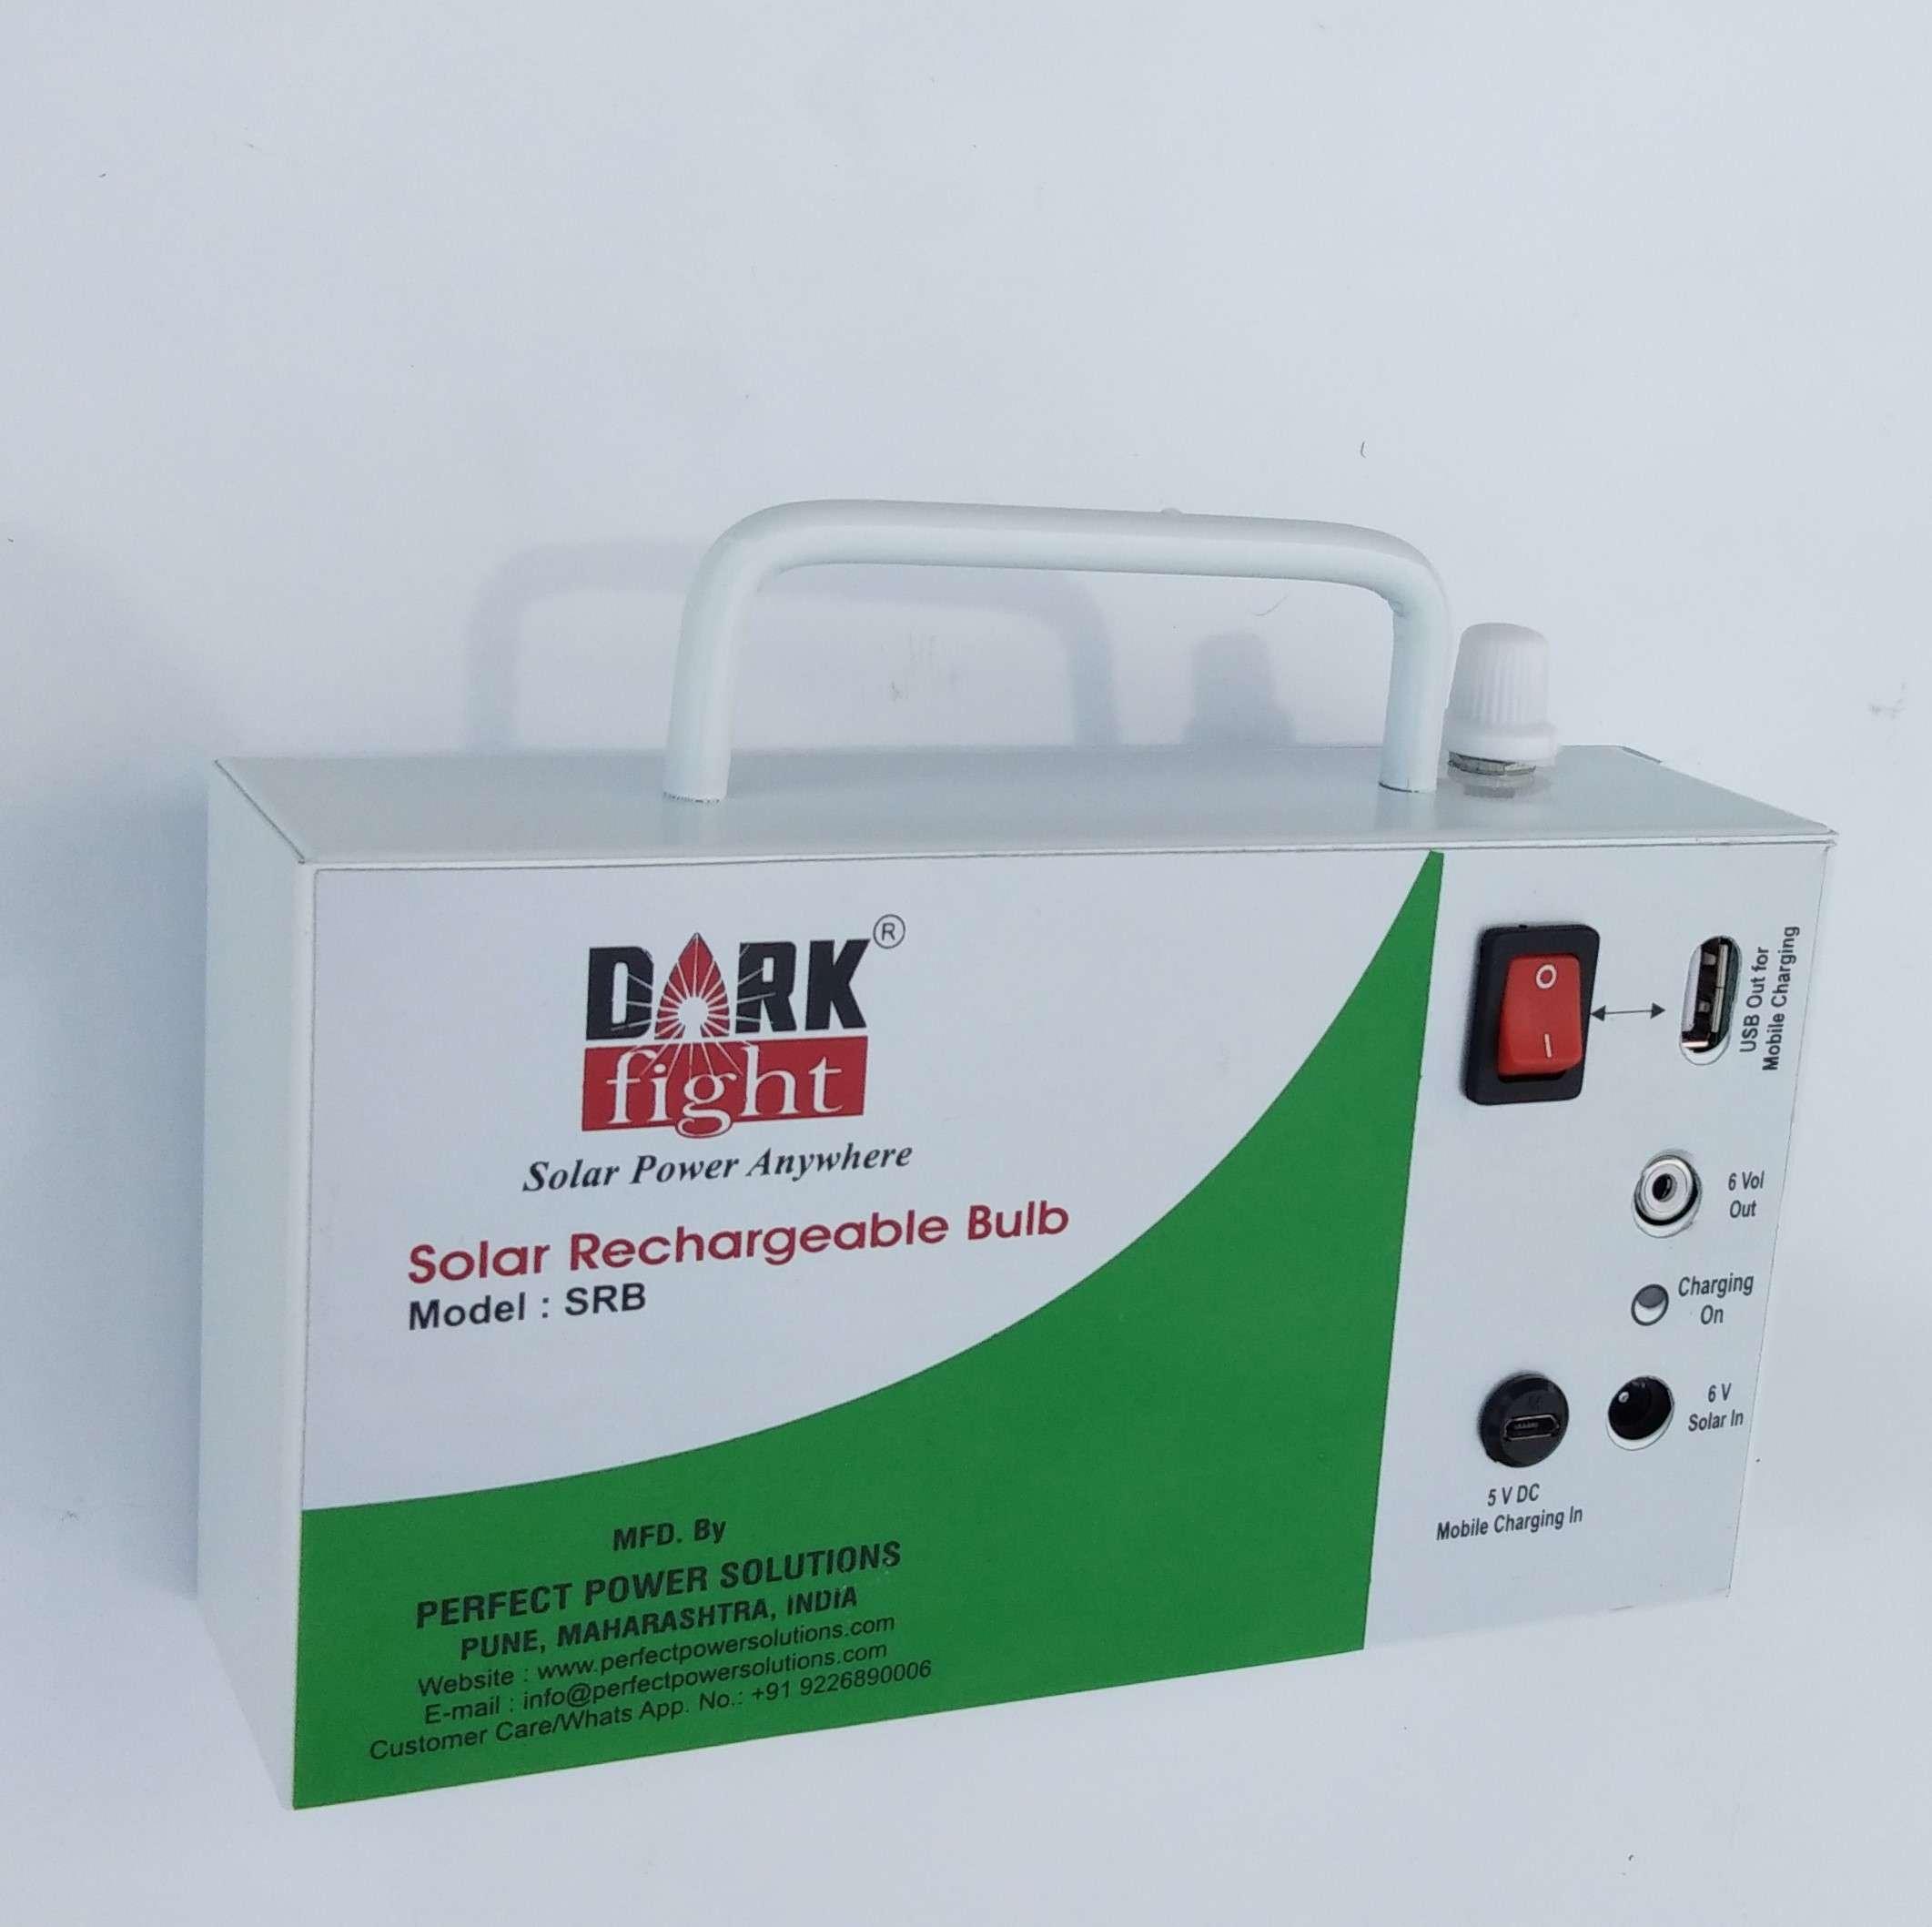 Solar Rechareable Bulb Main Unit